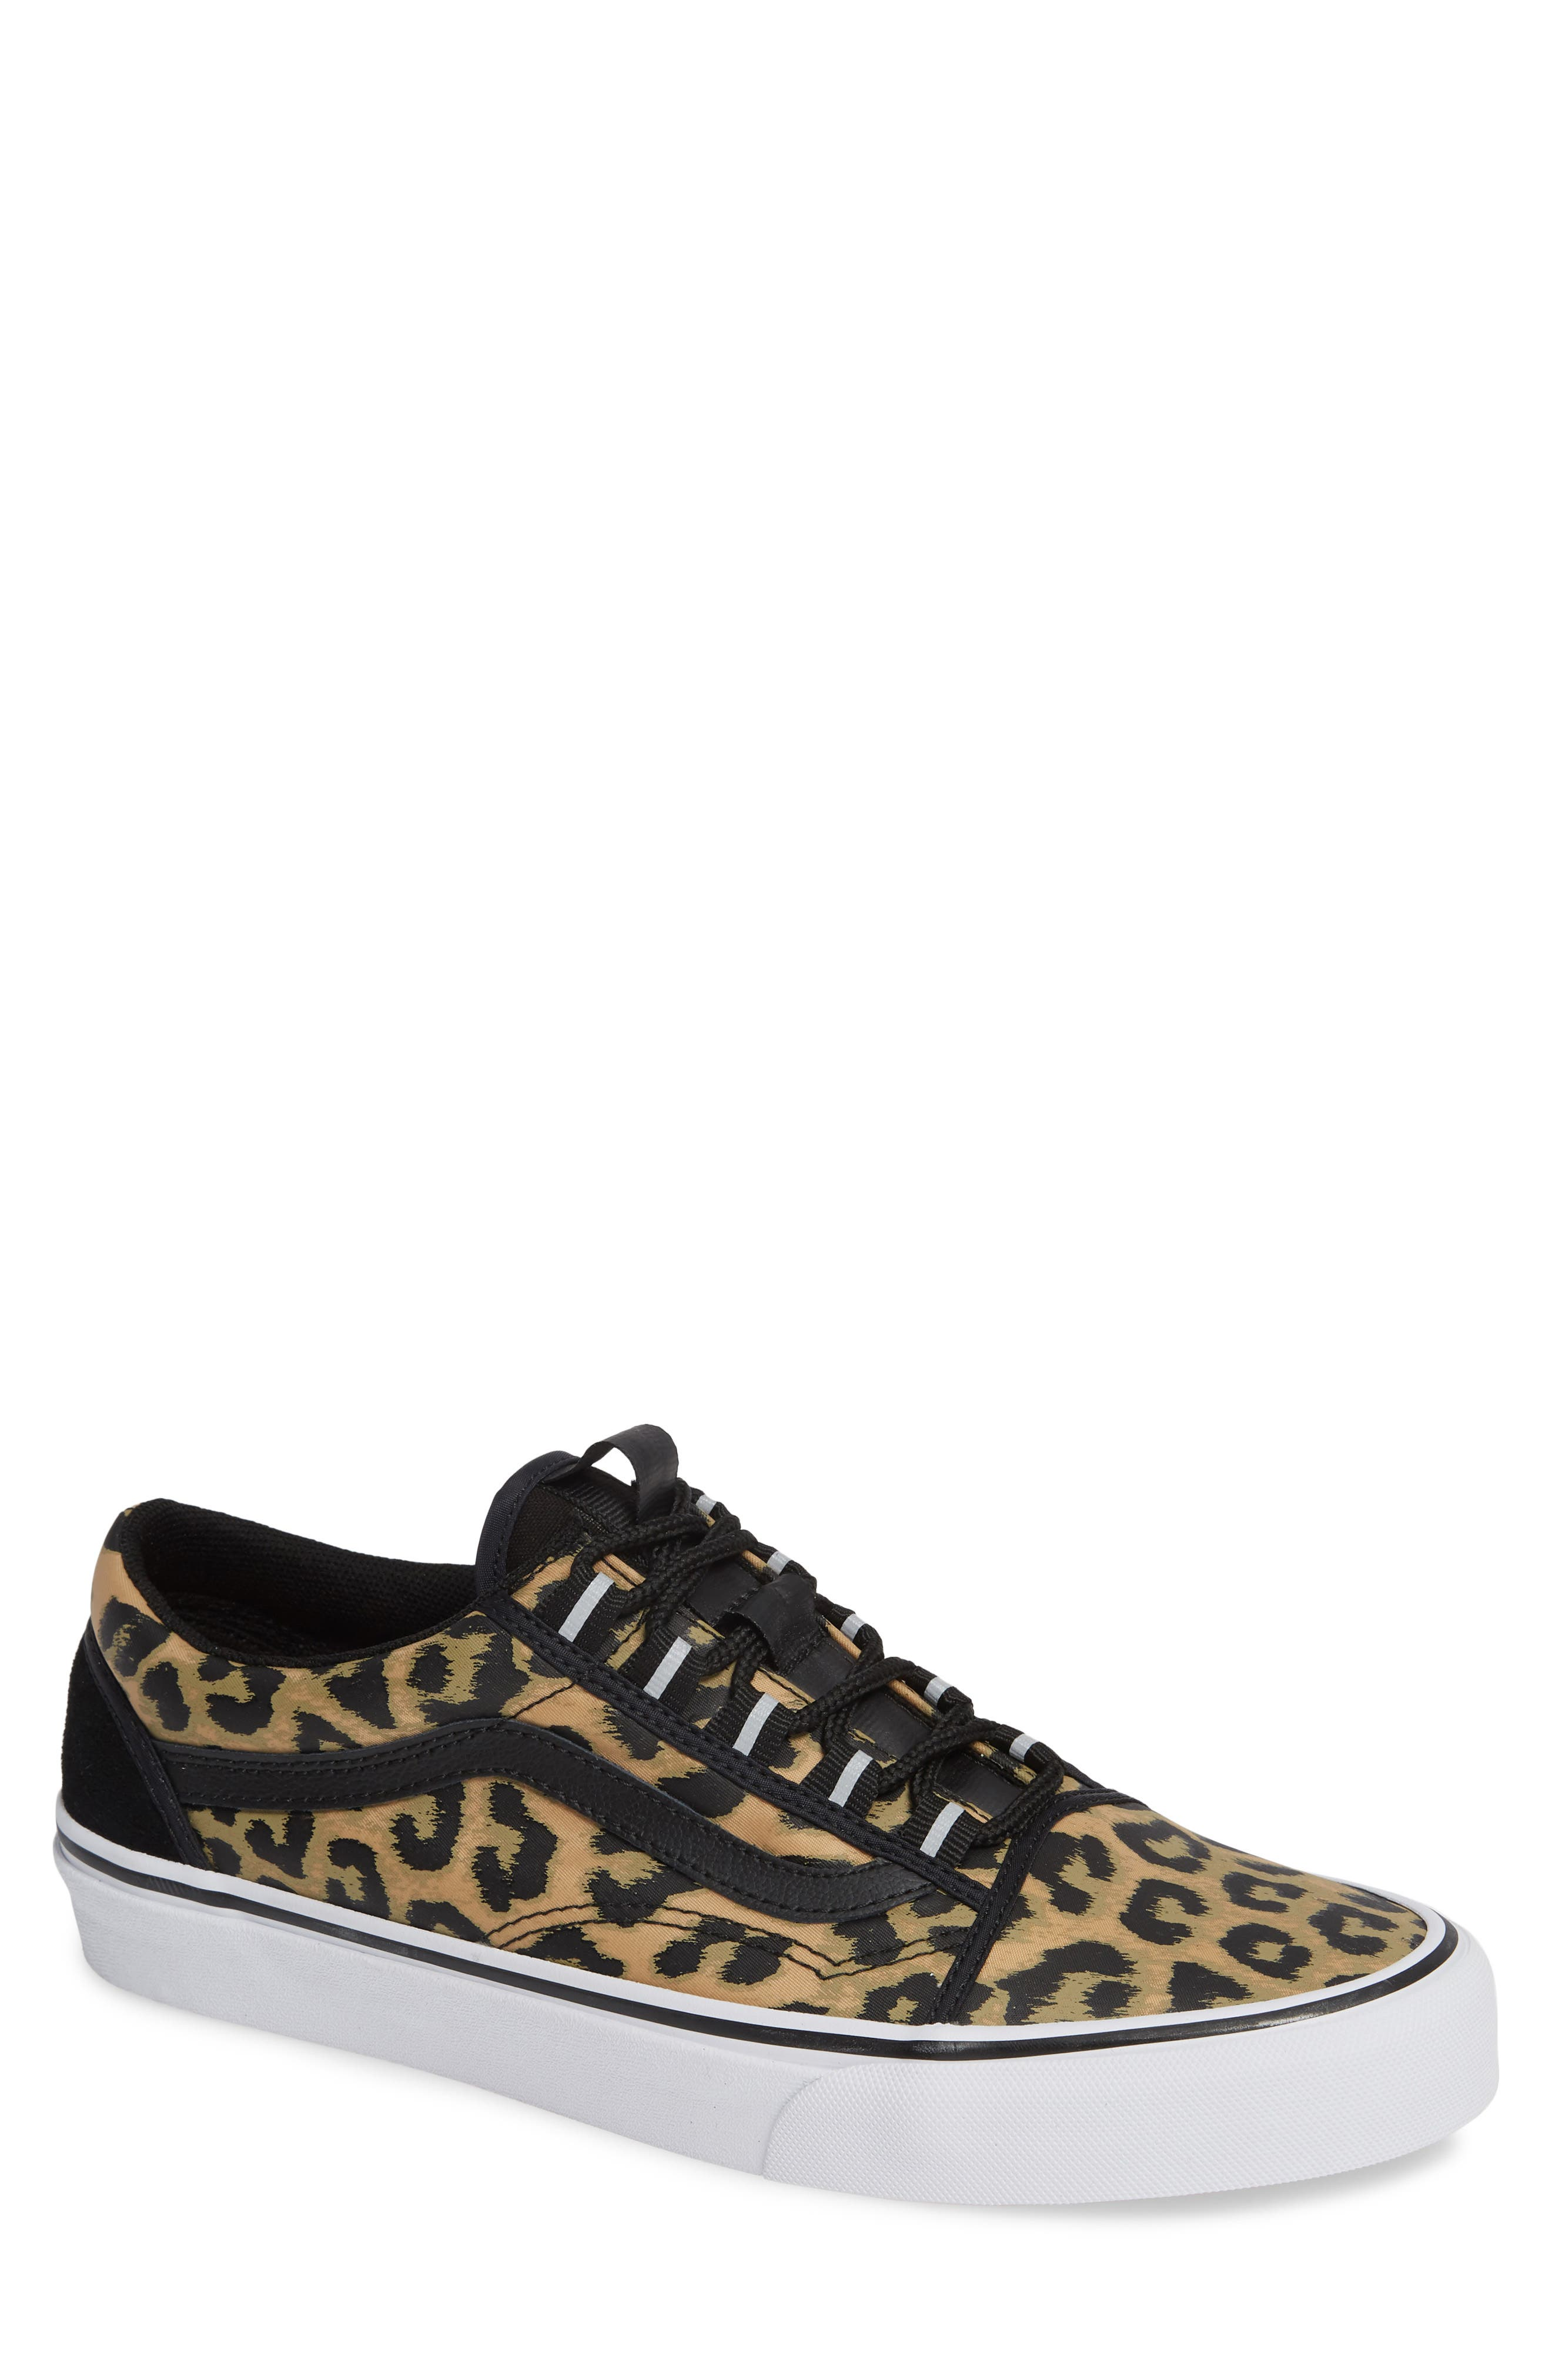 Old Skool Ghillie Sneaker,                         Main,                         color, BLACK NYLON/ LEOPARD NYLON